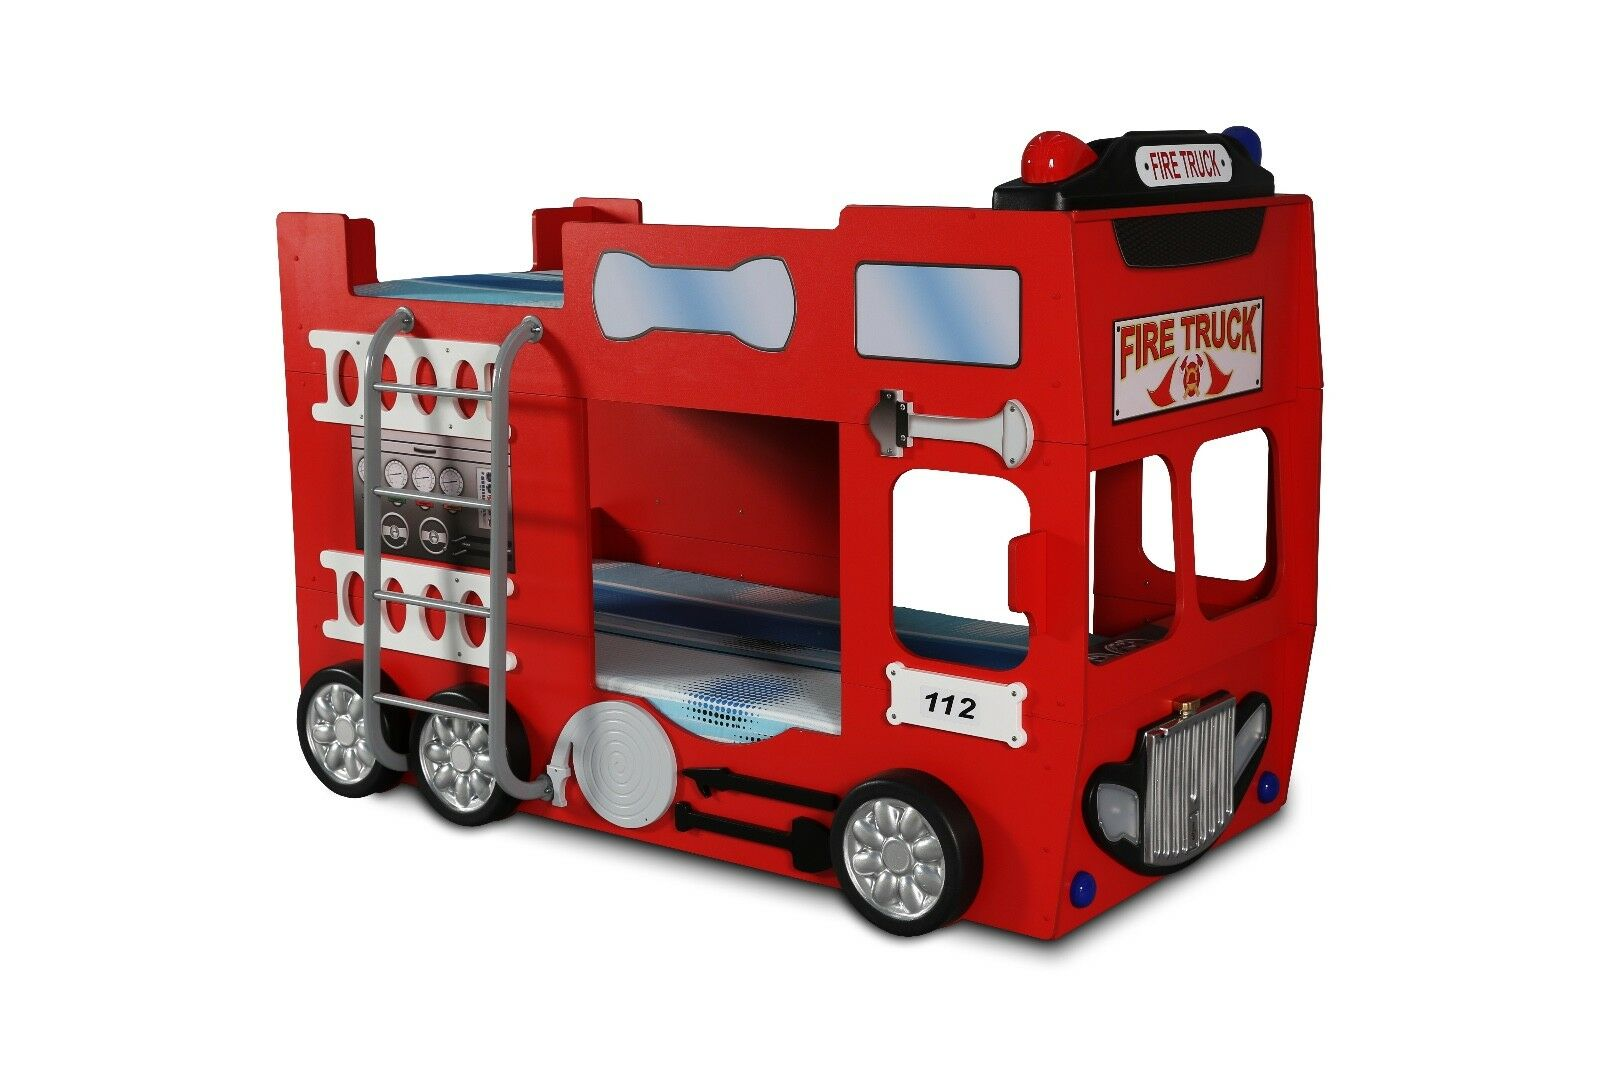 Bus Bett Etagenbett : Kinderzimmer bett kinderbett etagenbett feuerwehr